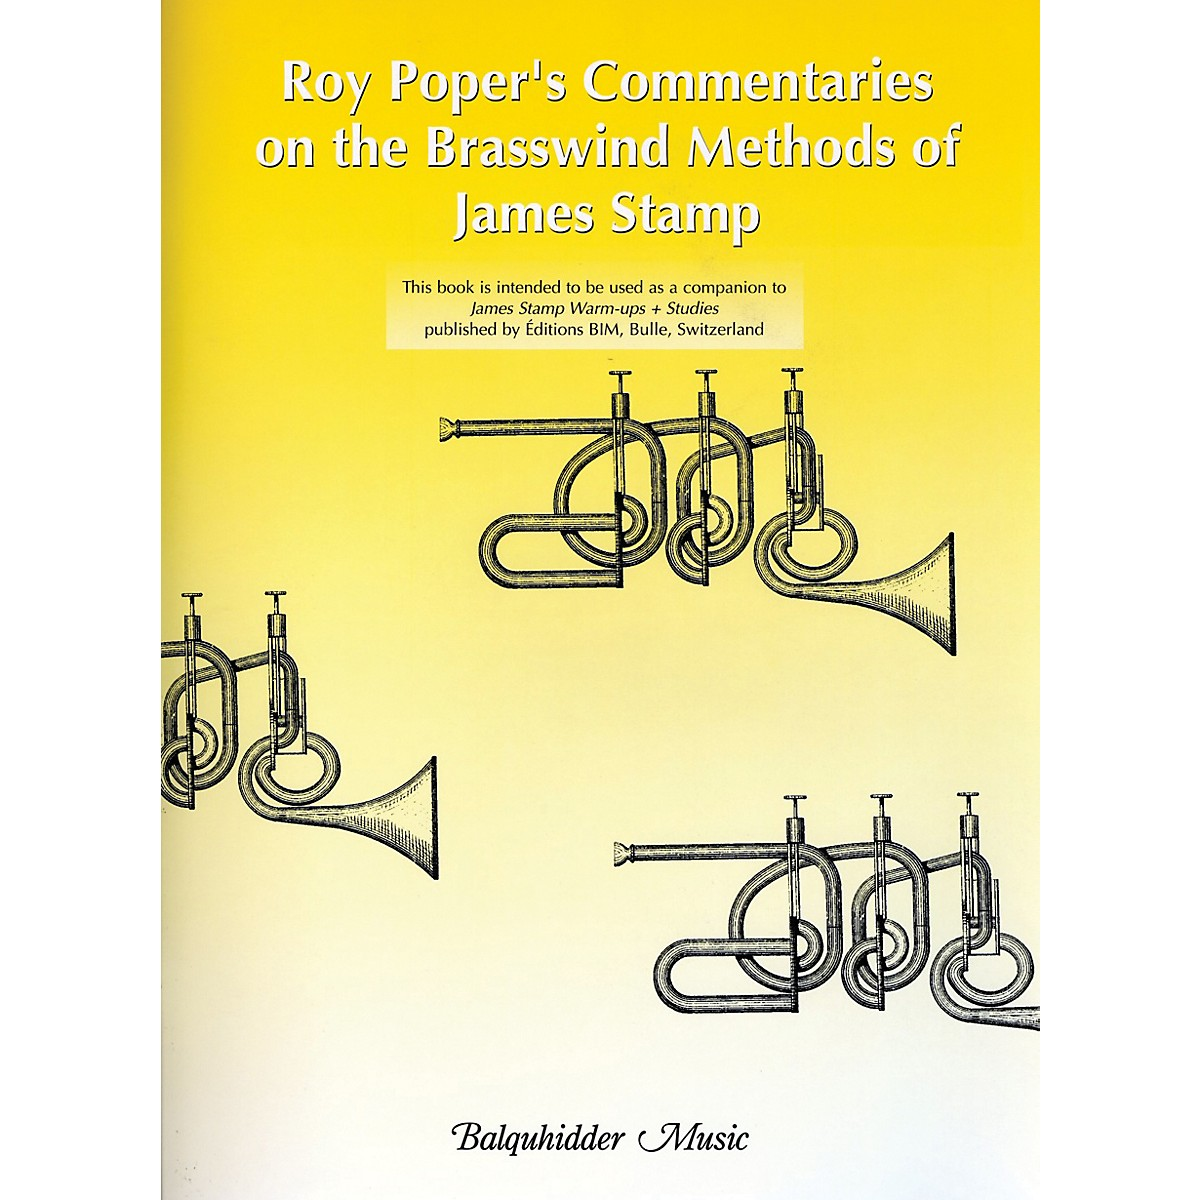 Carl Fischer Roy Poper's Commentaries on the Brasswind Methods of James Stamp Book